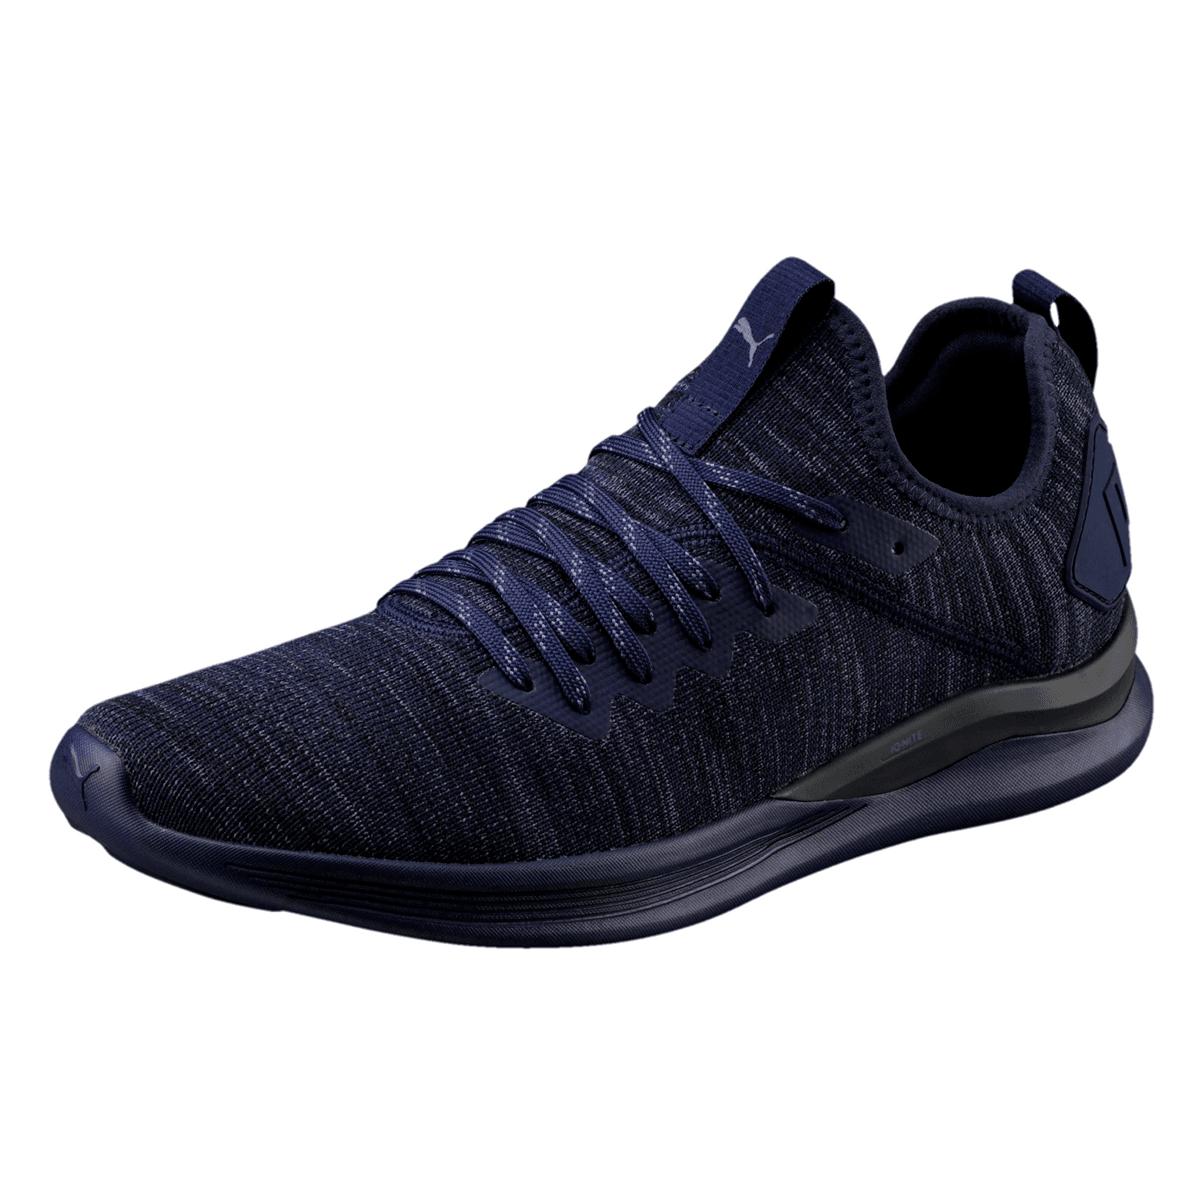 Puma Sneaker Ignite Flash evoKNIT dunkelblaublau